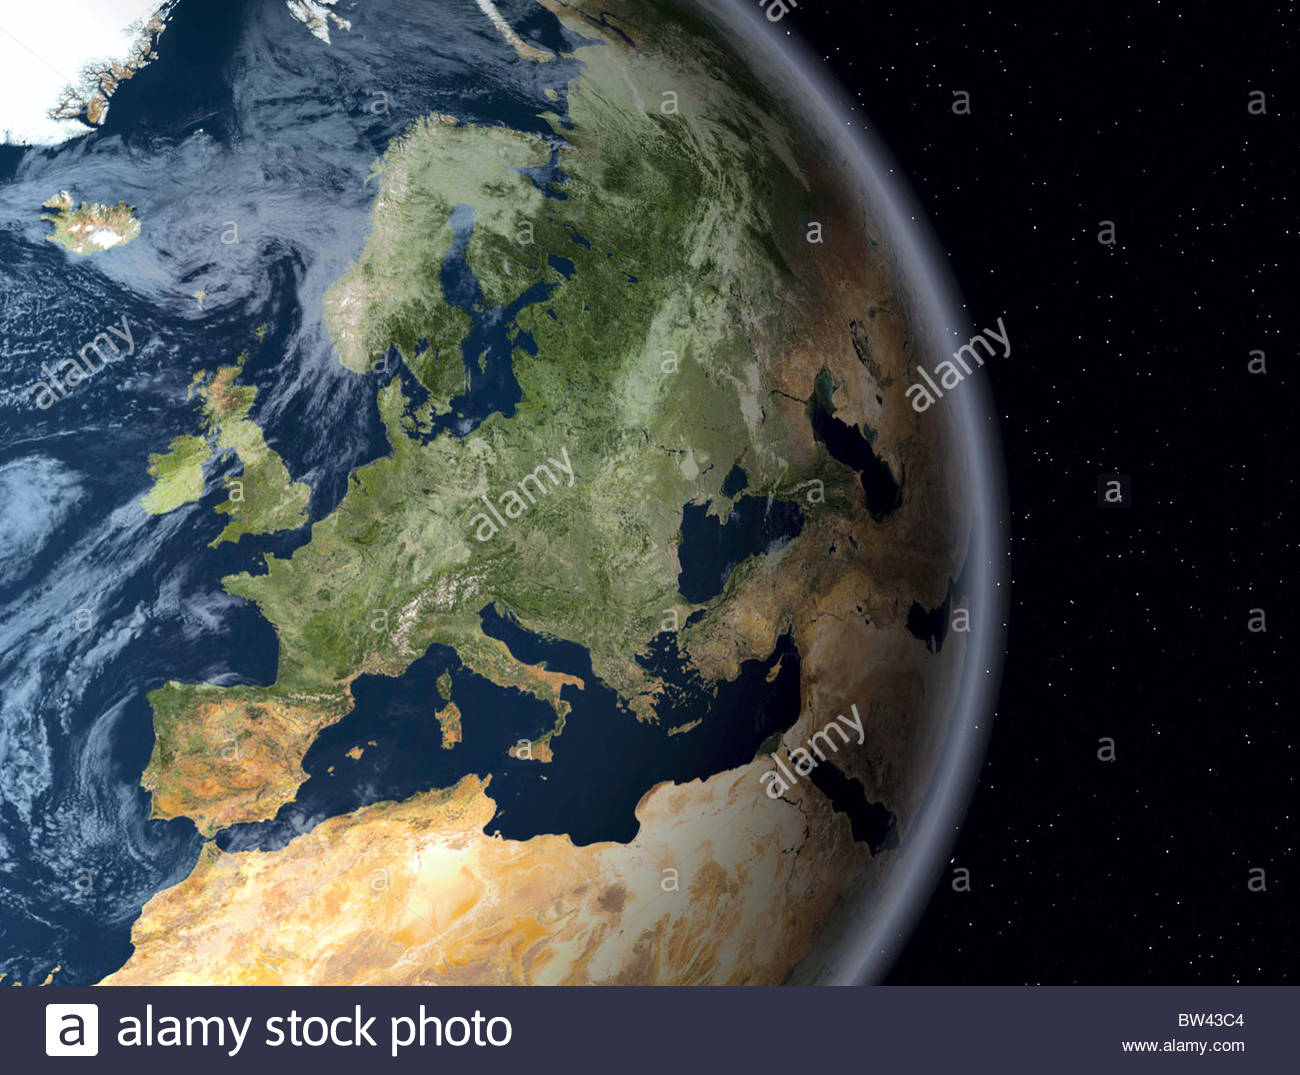 Globe with Europe - Stock Image